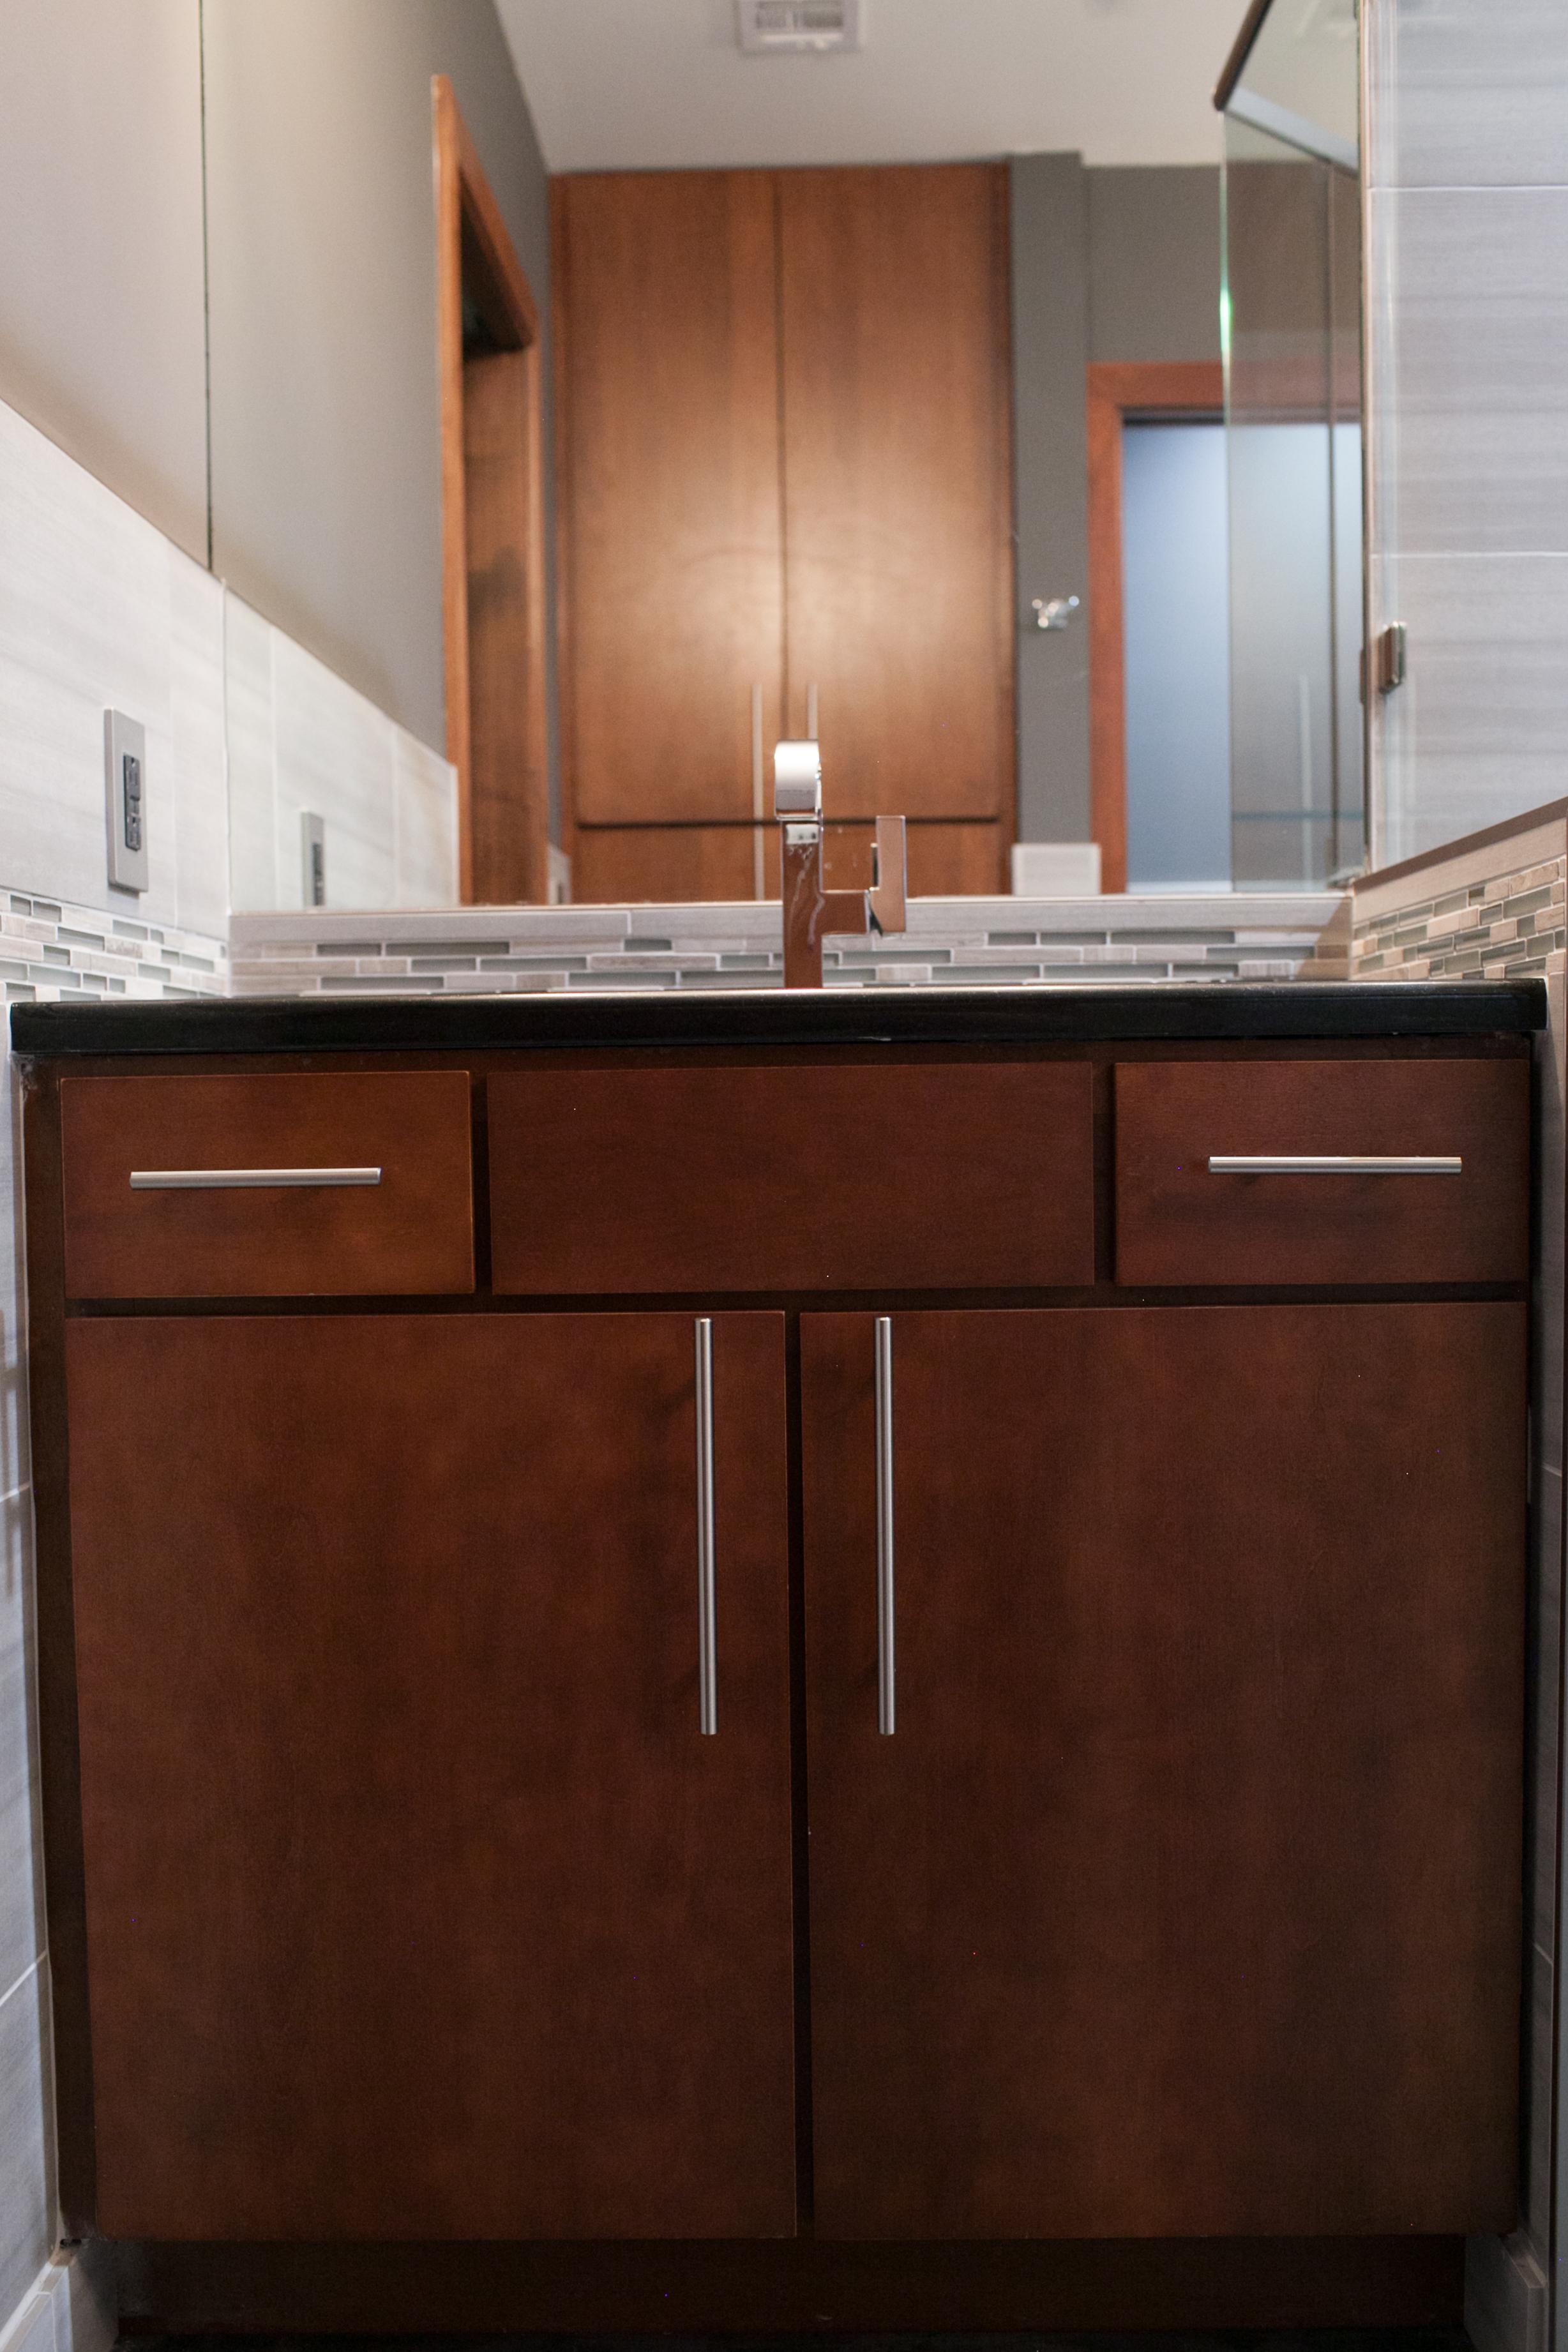 cherry cabinets and new tile backsplash - Pinnacle Homes, Inc.